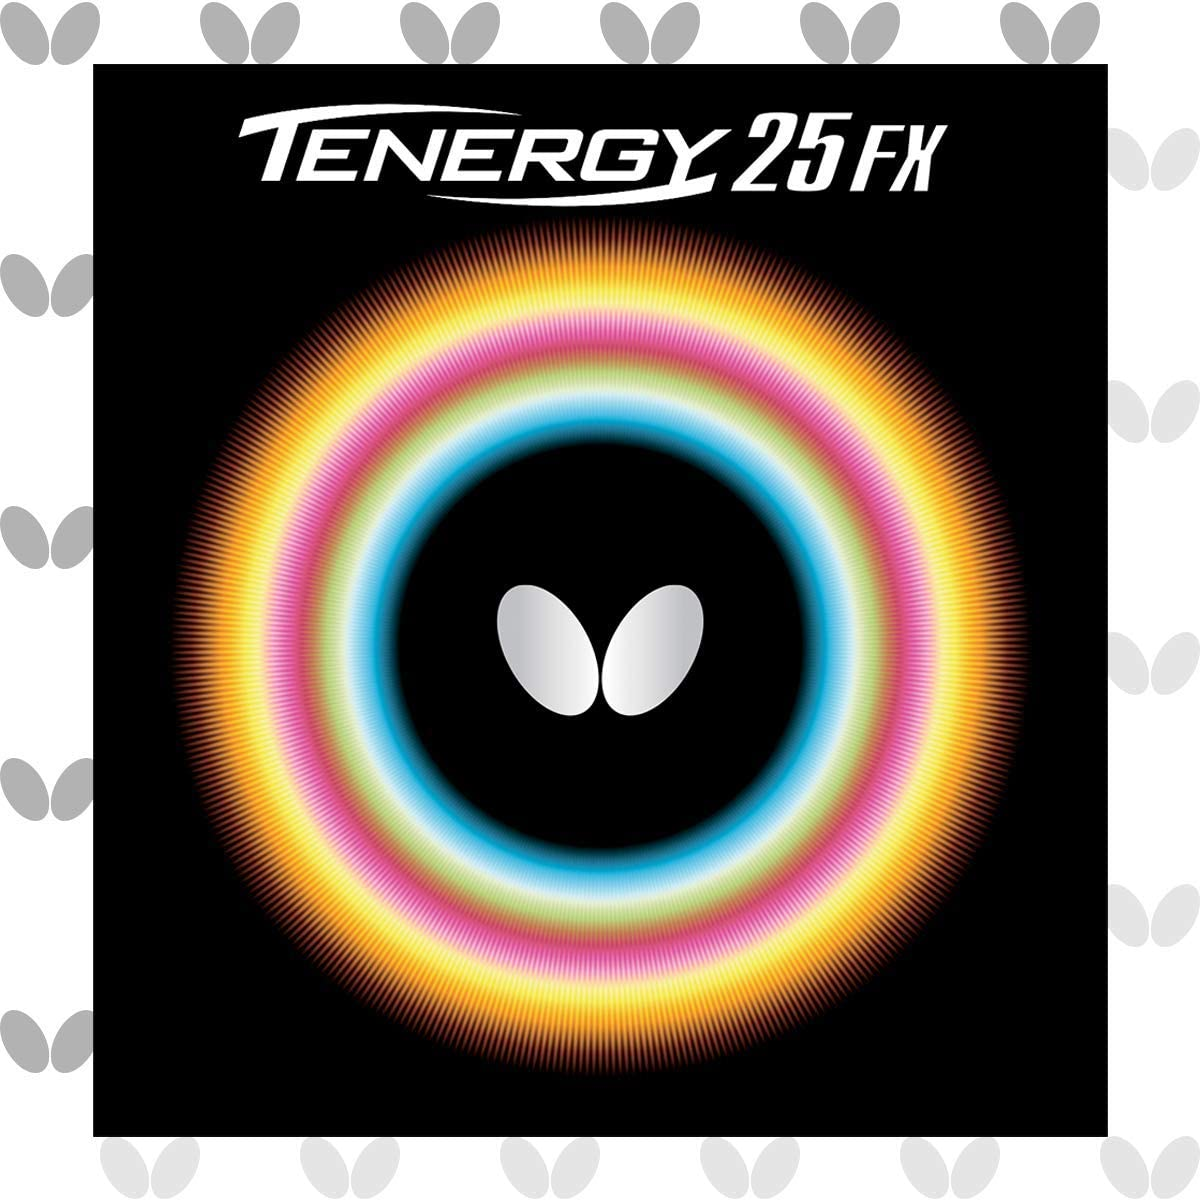 Butterfly Mariposa Tenergy 25FX Tenis de Mesa Caucho